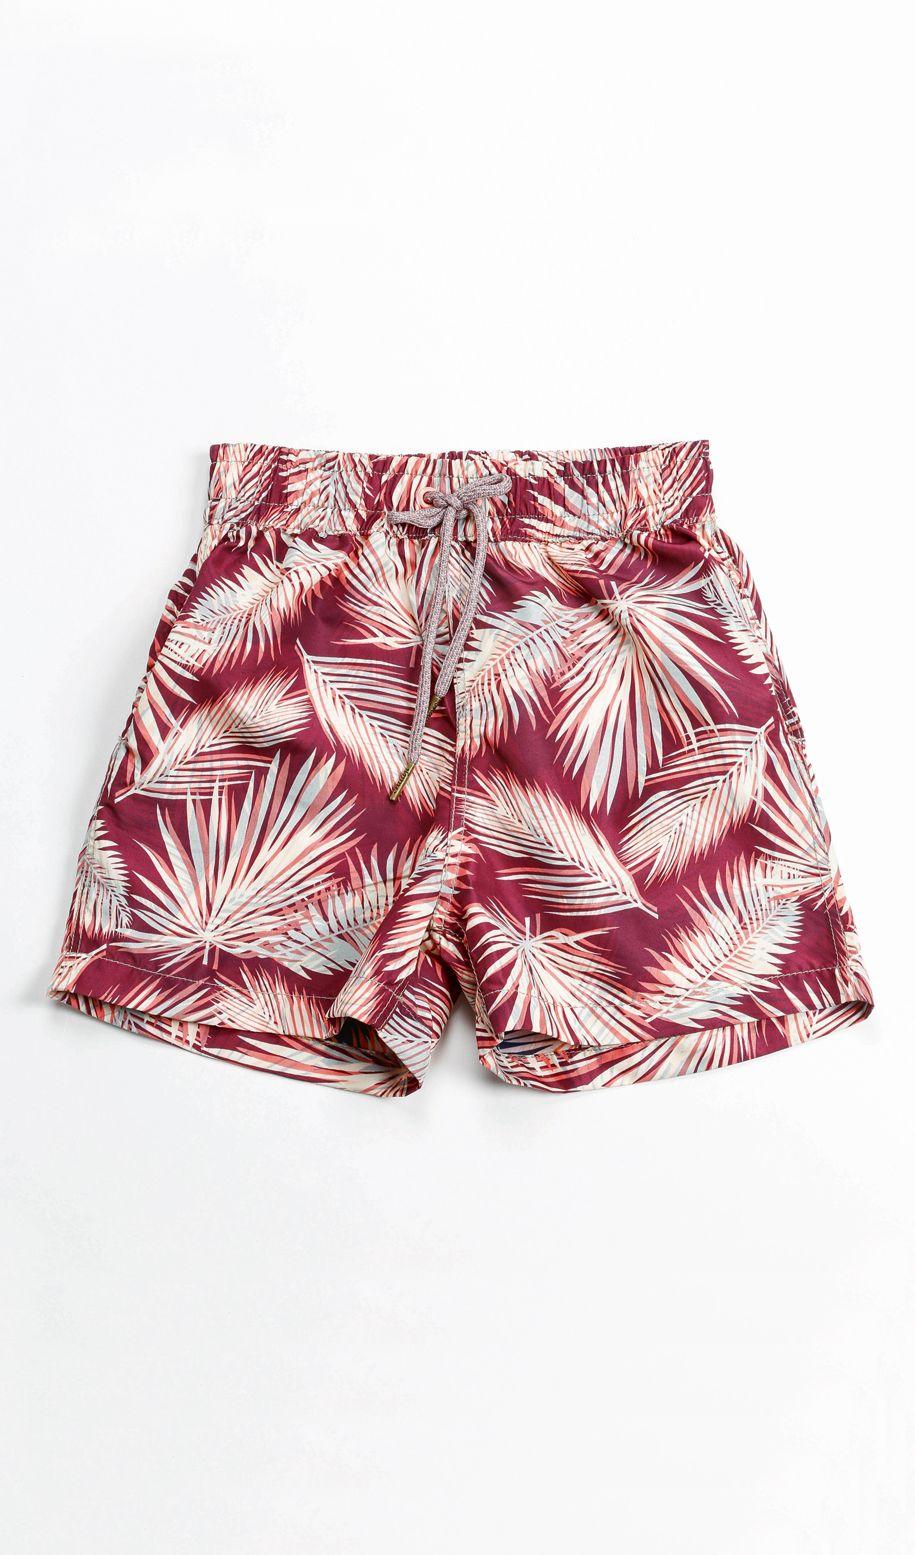 3408c7f389 Boys' Maaji Bommie Swim Trunks, $44, Kayokoko Swimwear